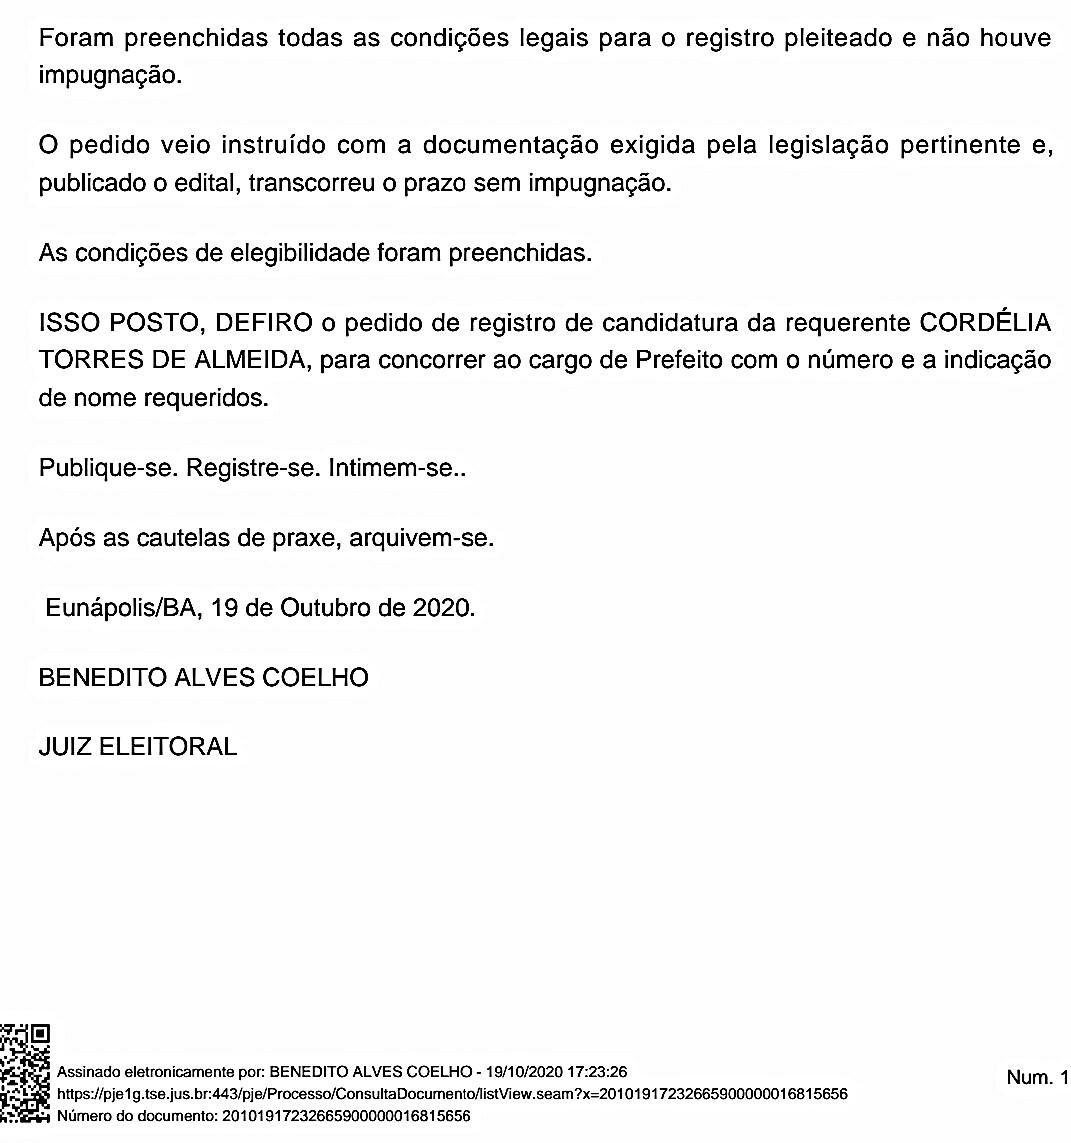 É DEFINITIVO: Juiz Eleitoral considera Cordélia apta para concorrer ao cargo de prefeita 29